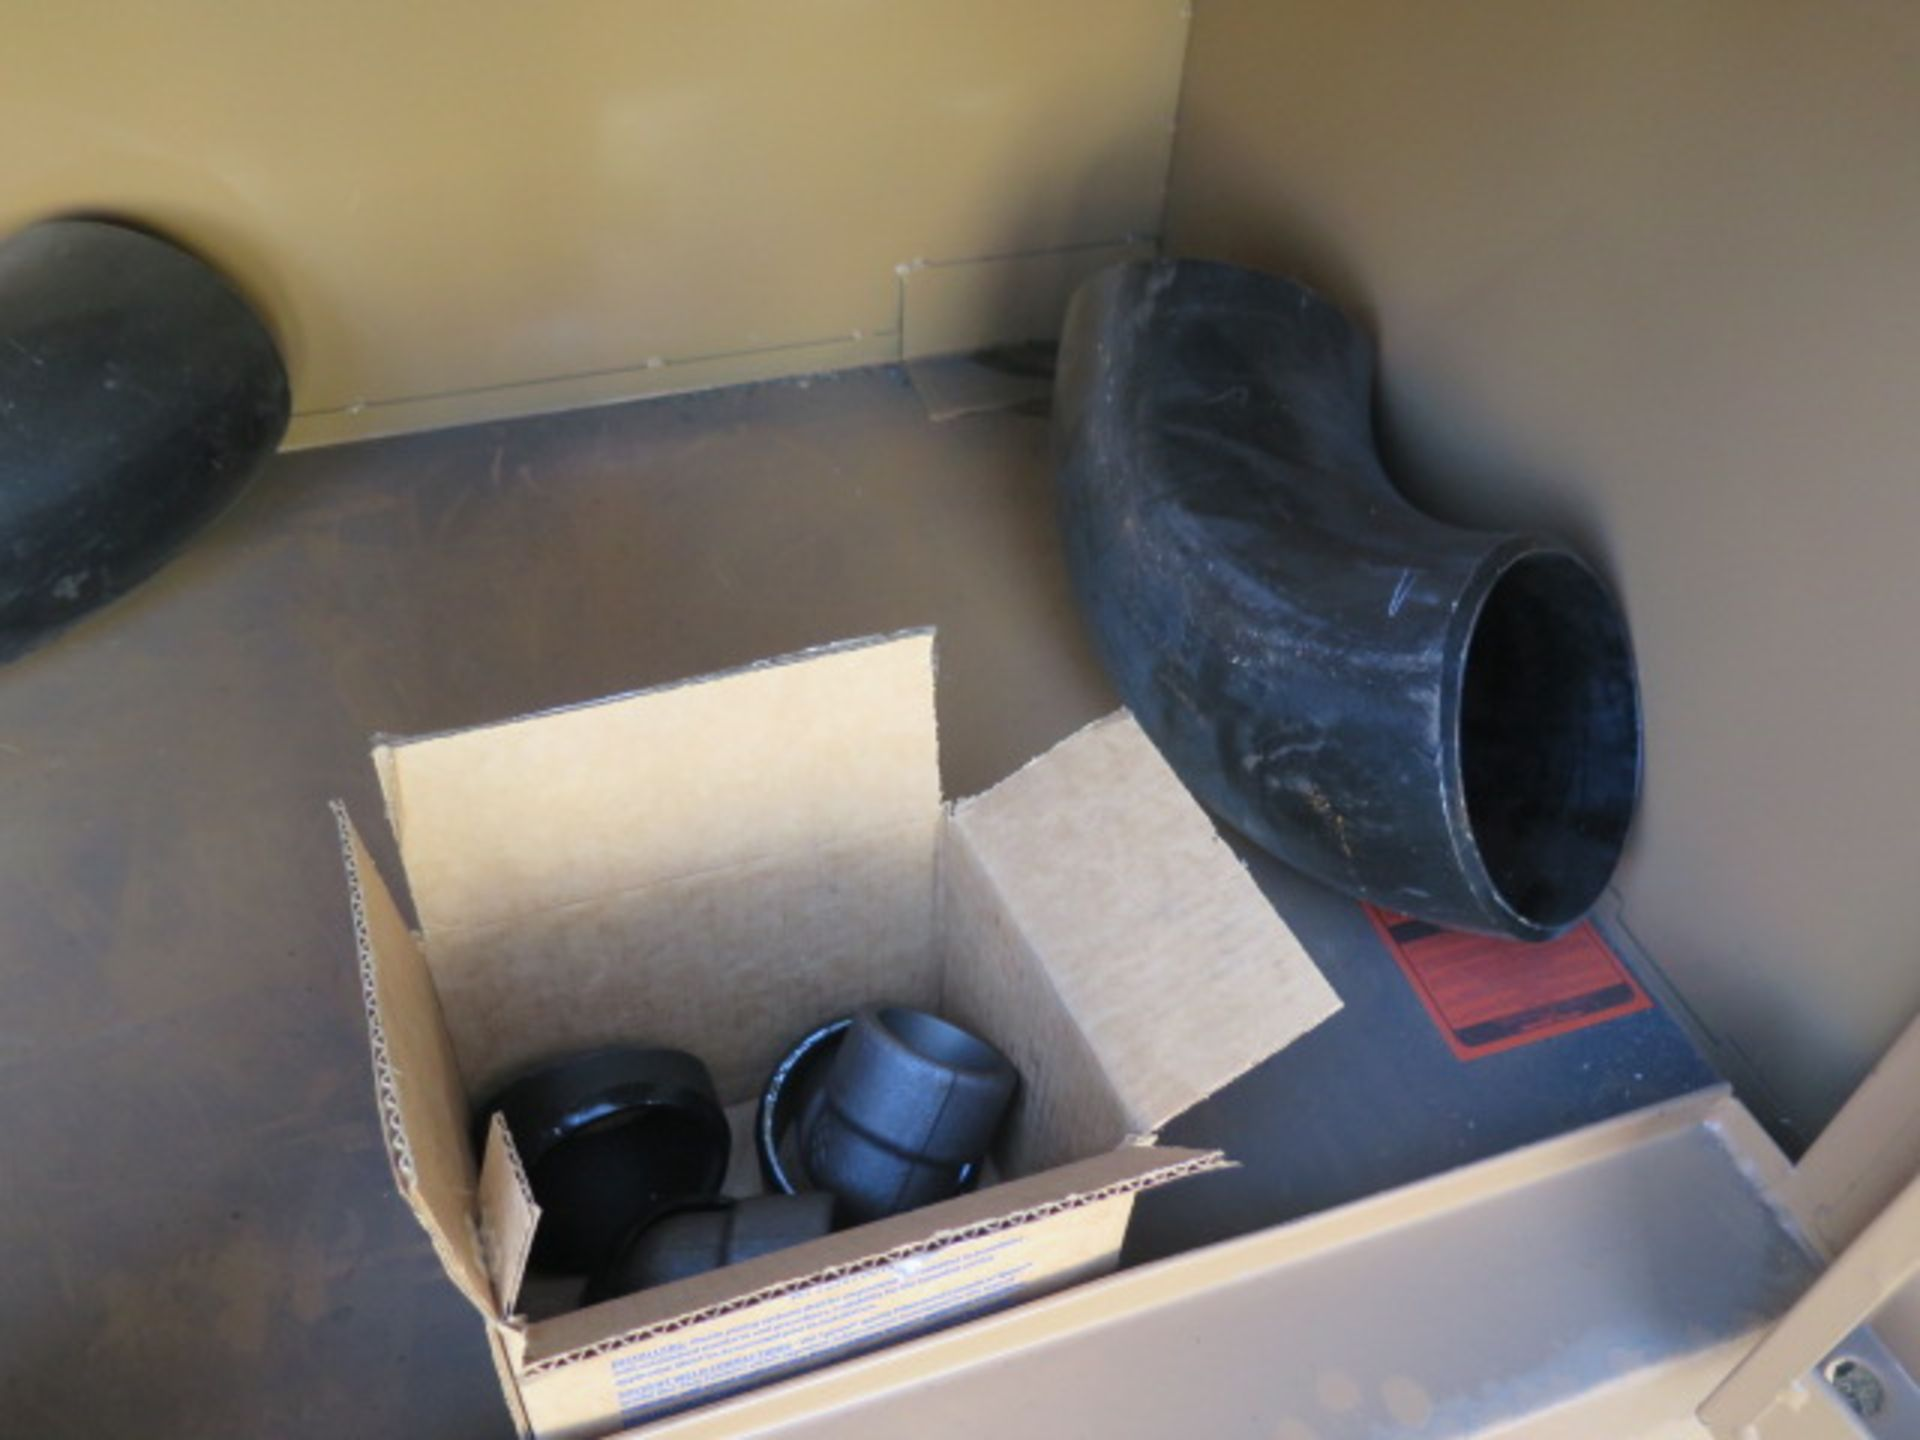 Knaack mdl. 139 Jobmaster Job Box (SOLD AS-IS - NO WARRANTY) - Image 11 of 17